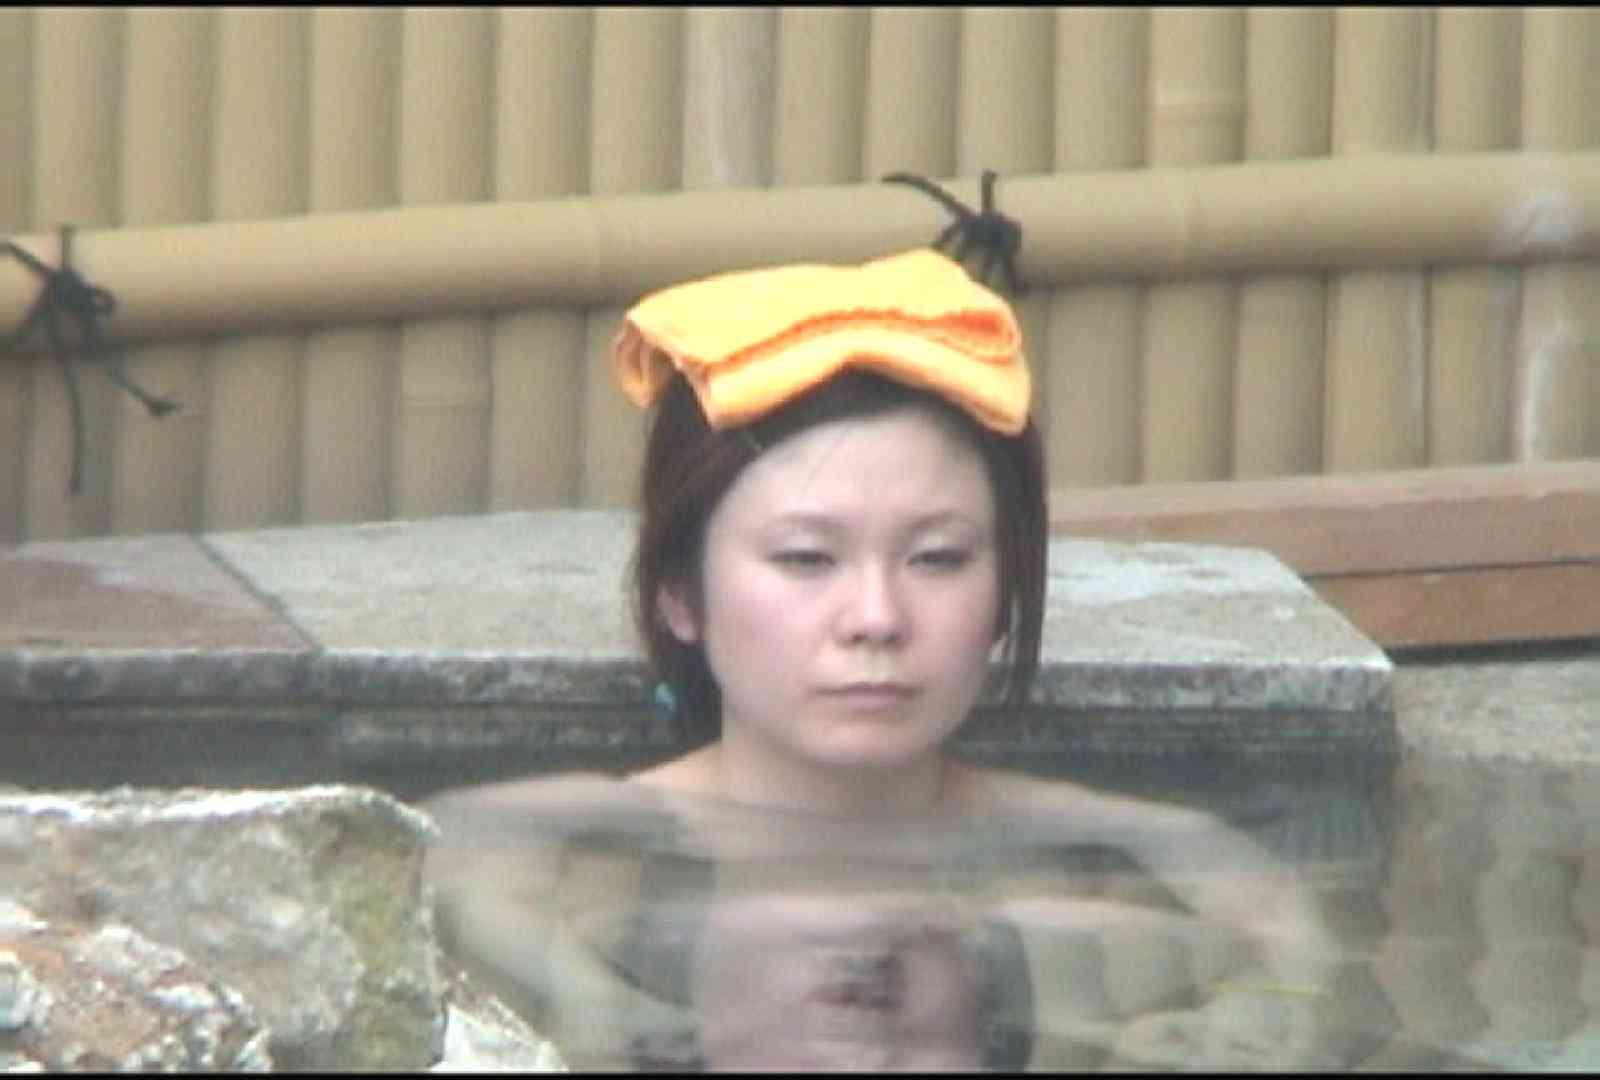 Aquaな露天風呂Vol.177 盗撮師作品  102pic 87